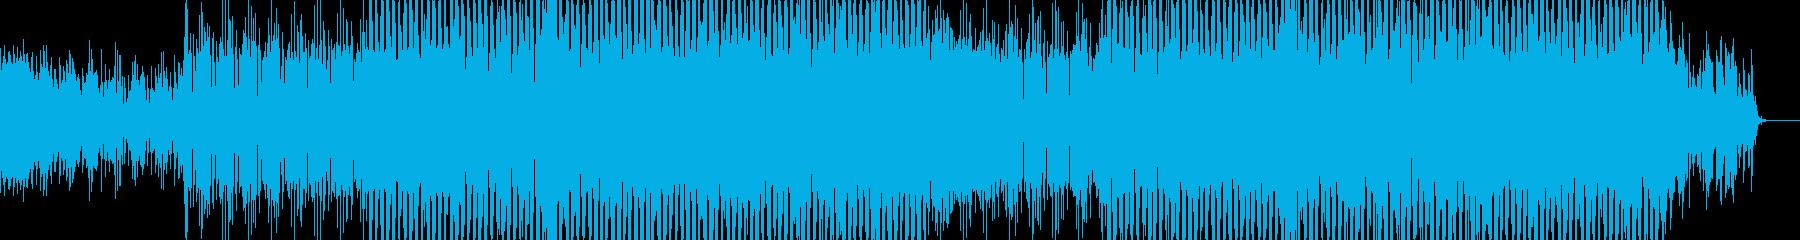 EDMクラブ系ダンスミュージック-101の再生済みの波形